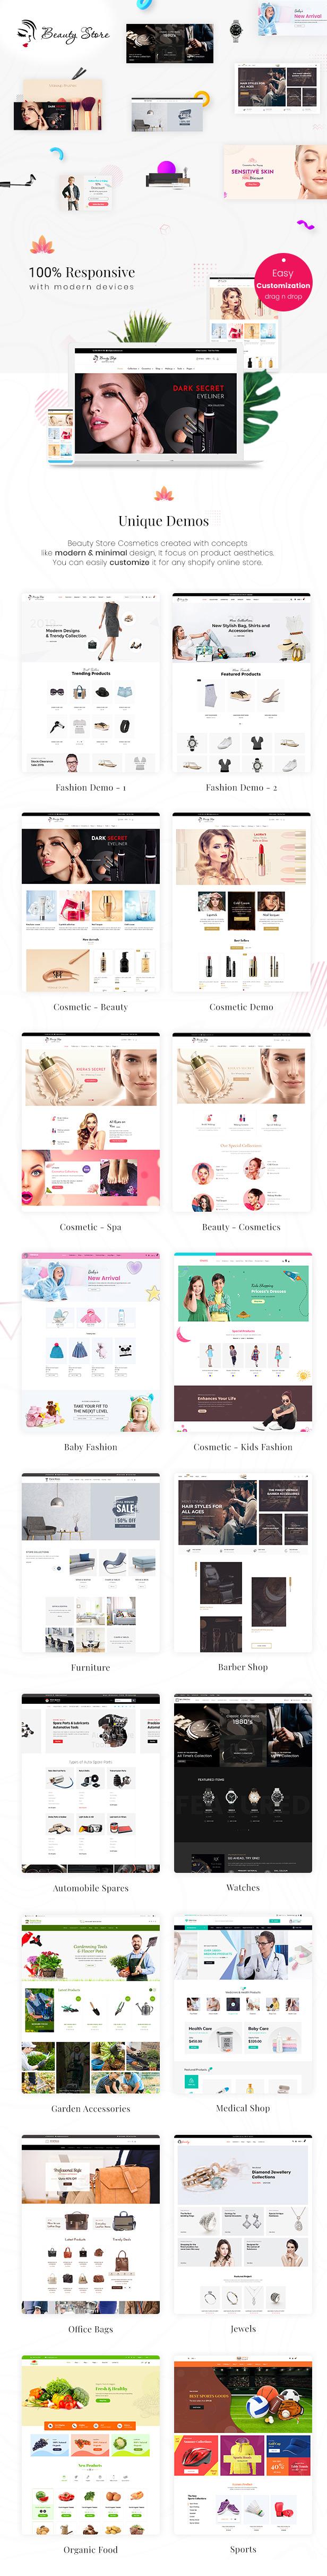 Beauty Store - Cosmetics & Fashion Shopify Theme - 1